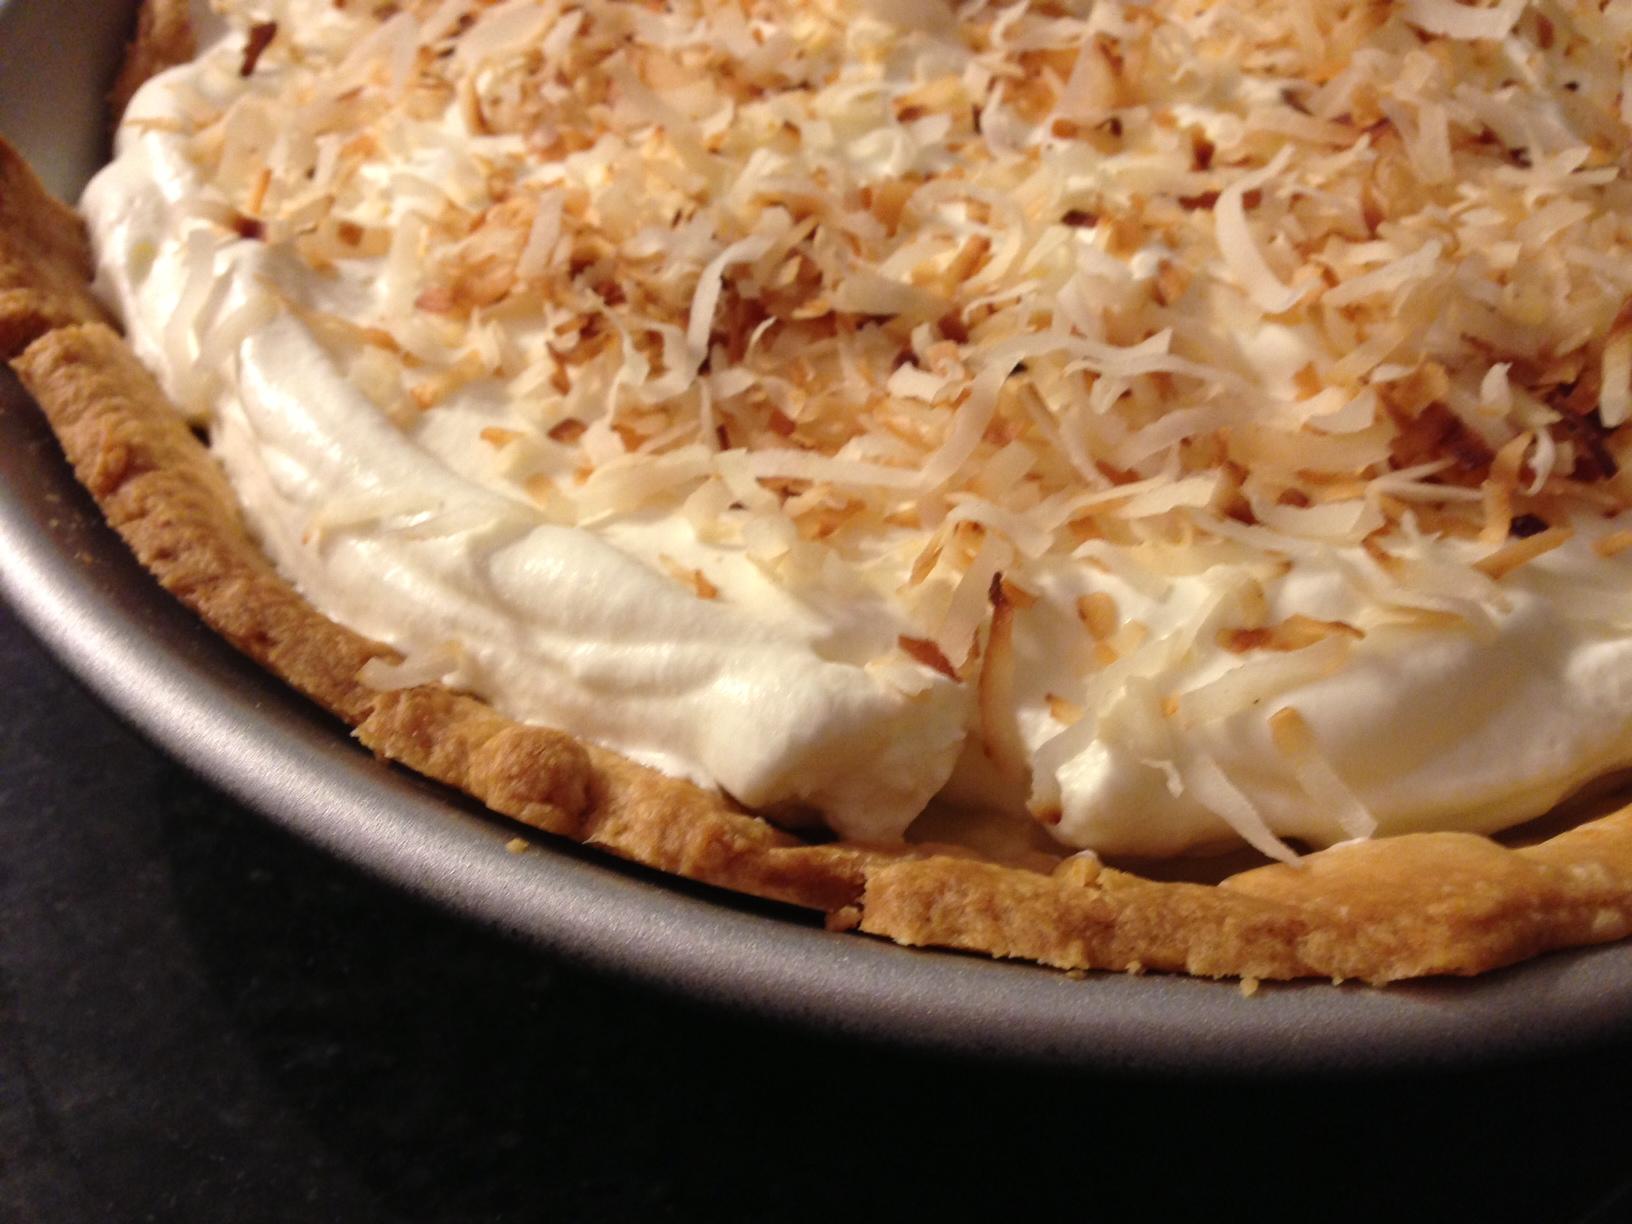 Coconut Cream Pie | The Dough Will Rise Again